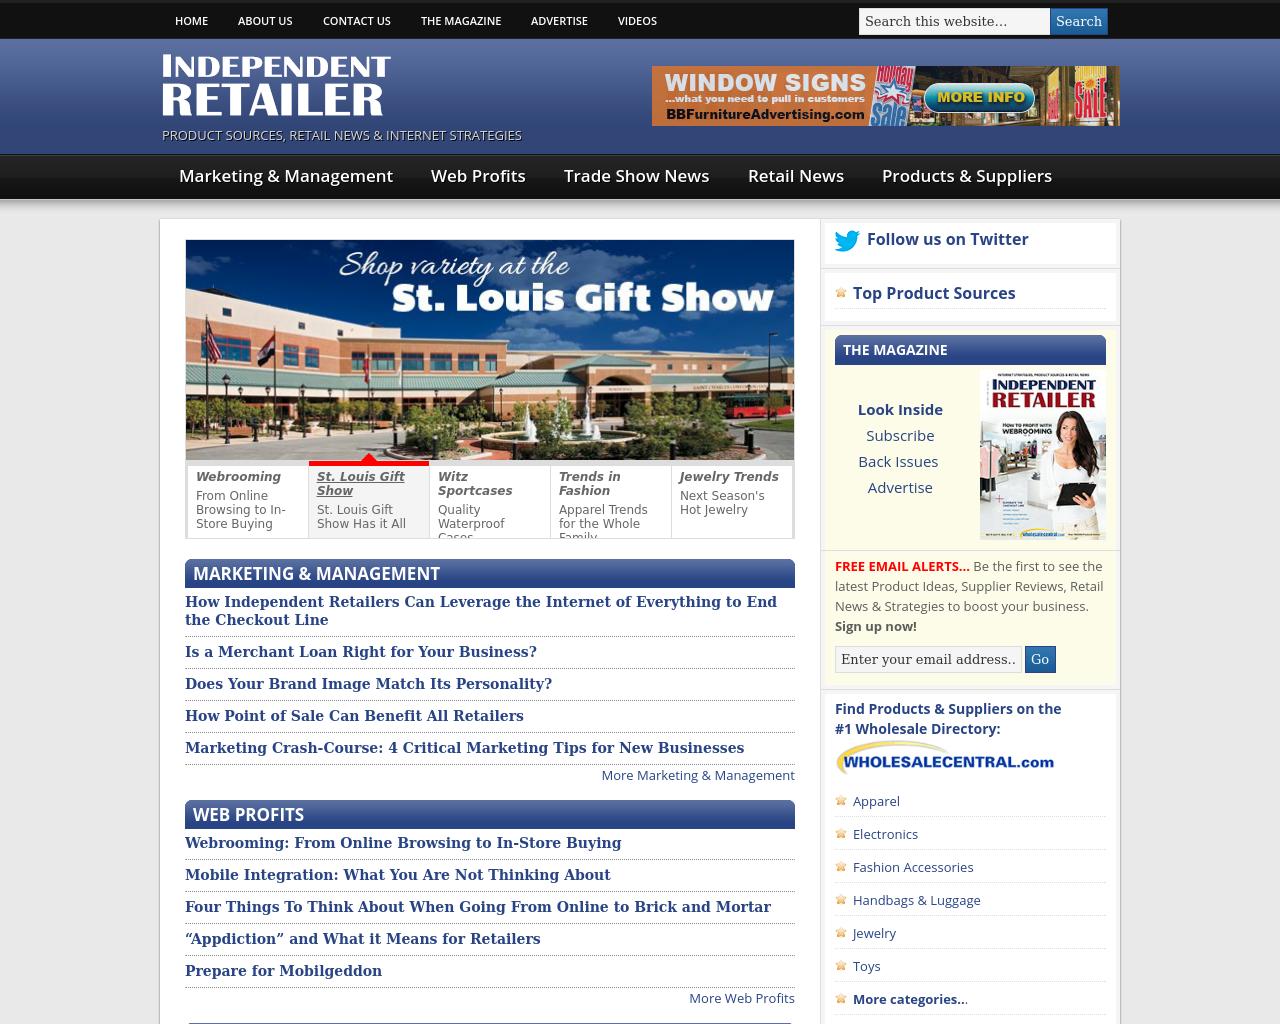 Independent-Retailer-Advertising-Reviews-Pricing